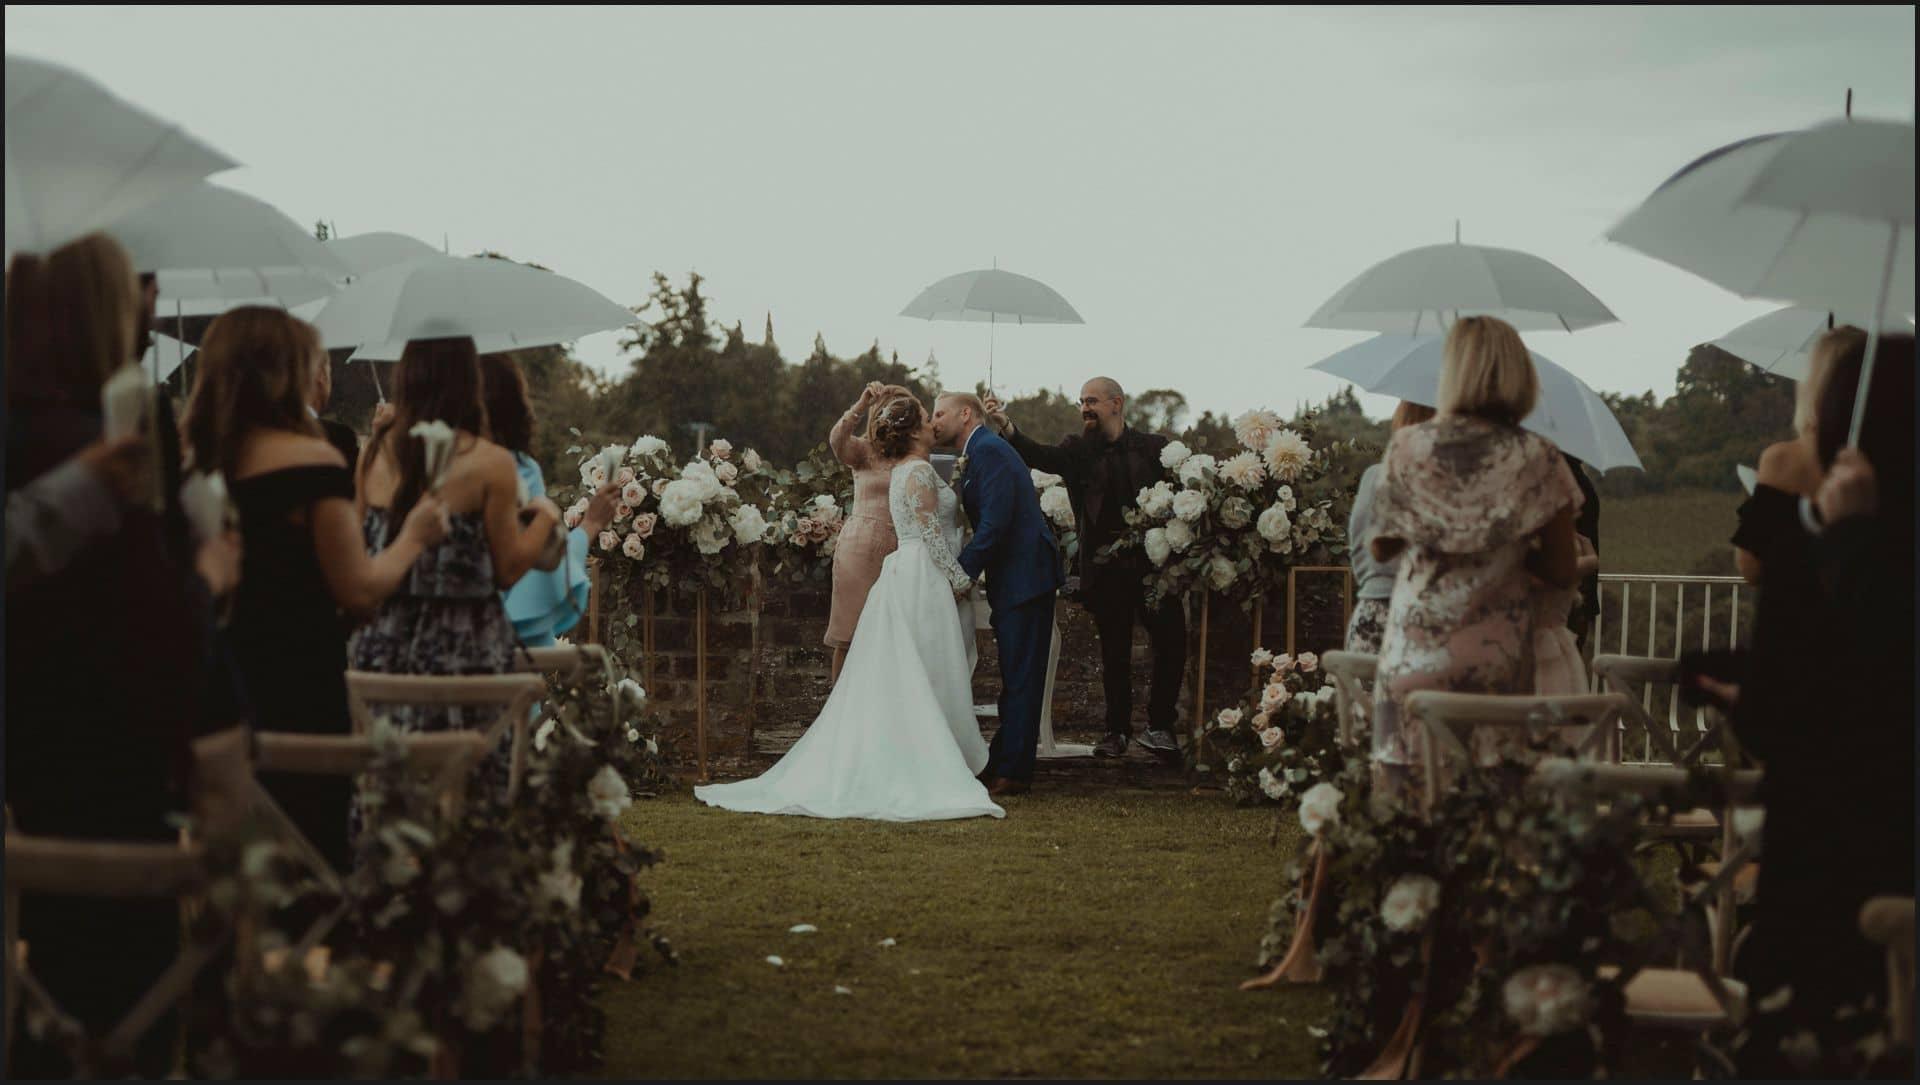 tuscany, destination wedding, chianti, wedding ceremony, bride, groom